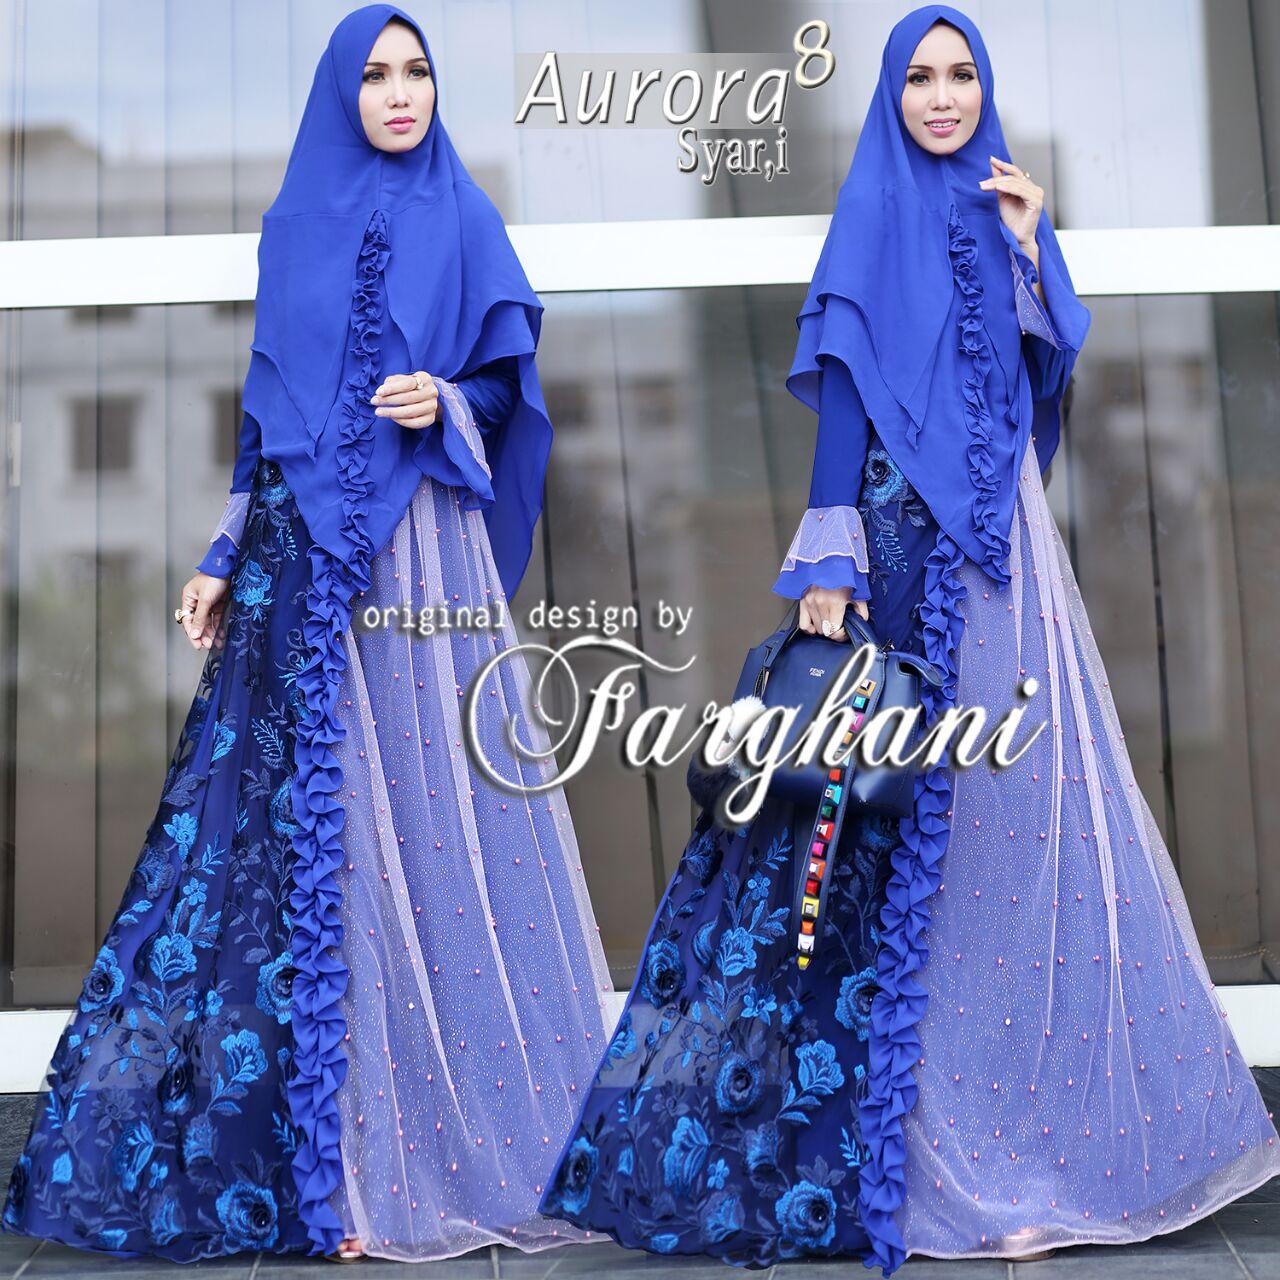 Aurora Long Skirt Warna Abu Daftar Harga Terkini Dan My Size Pants Pencil Abuaz492 Muda 3l 8 By Farghani